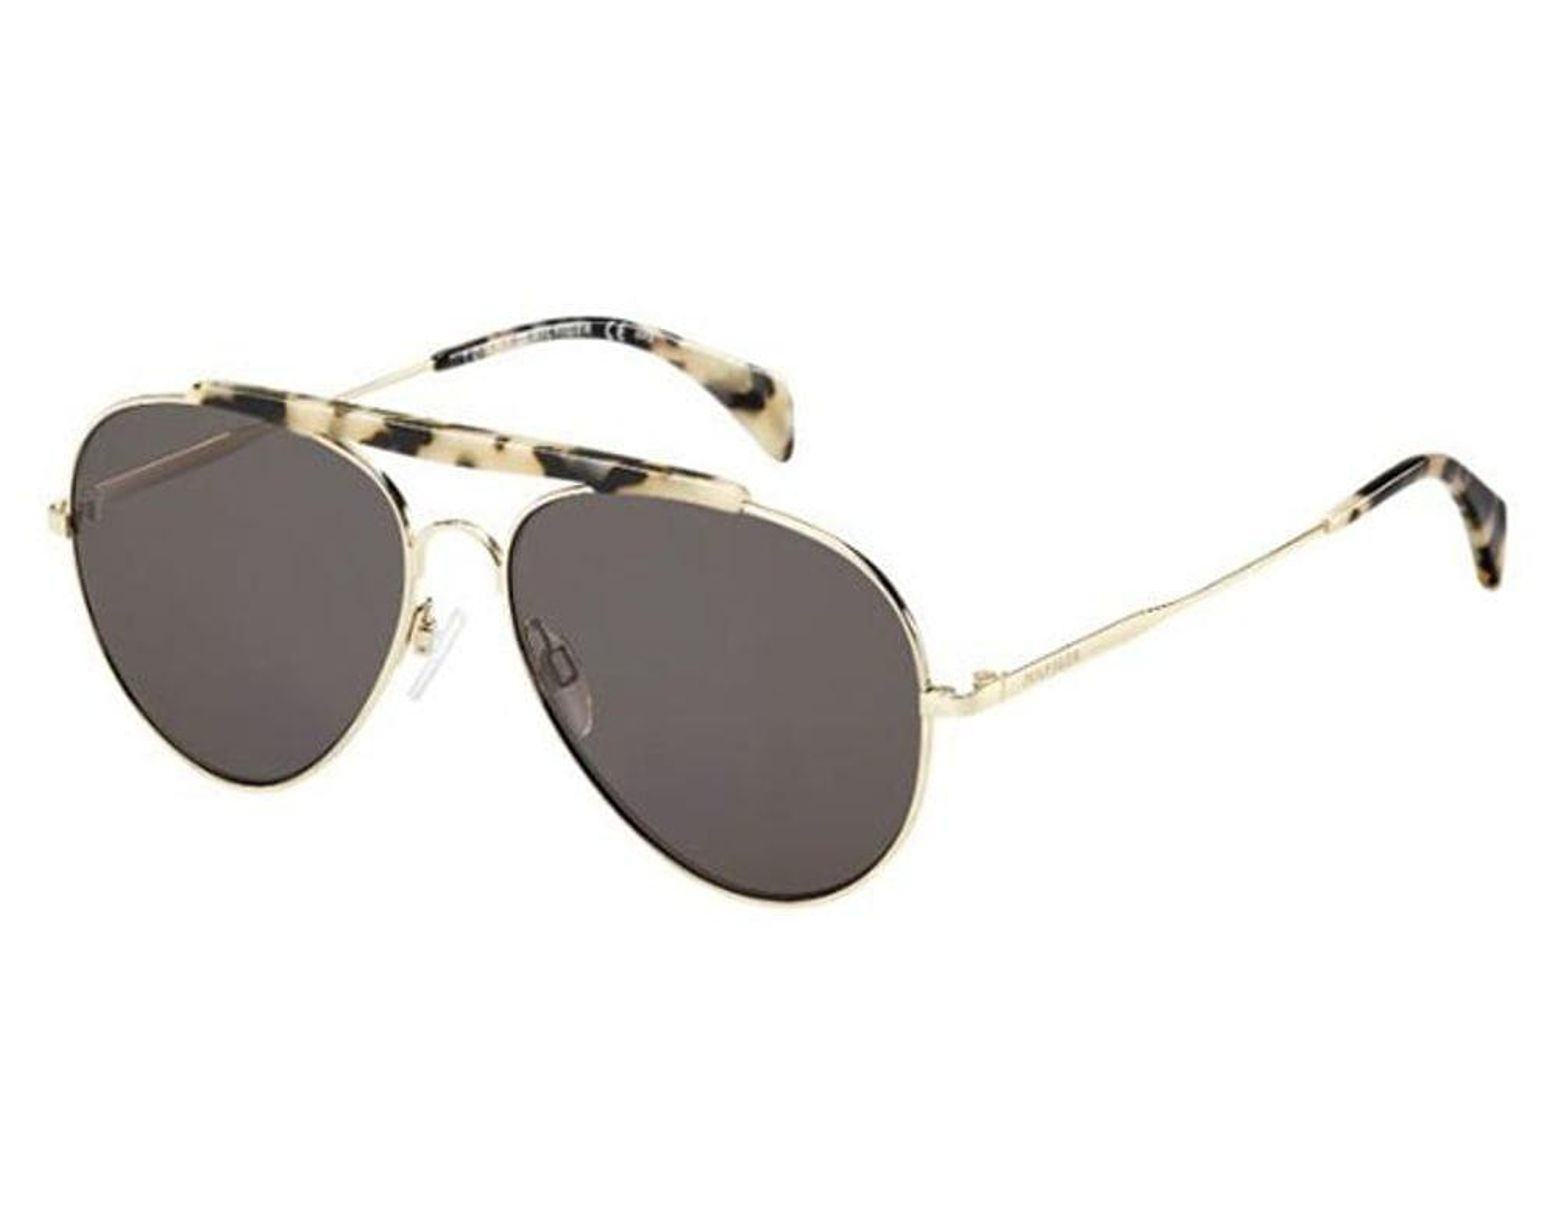 Tommy Hilfiger X Gigi Hadid3 Women/'s Modified Pilot Sunglasses